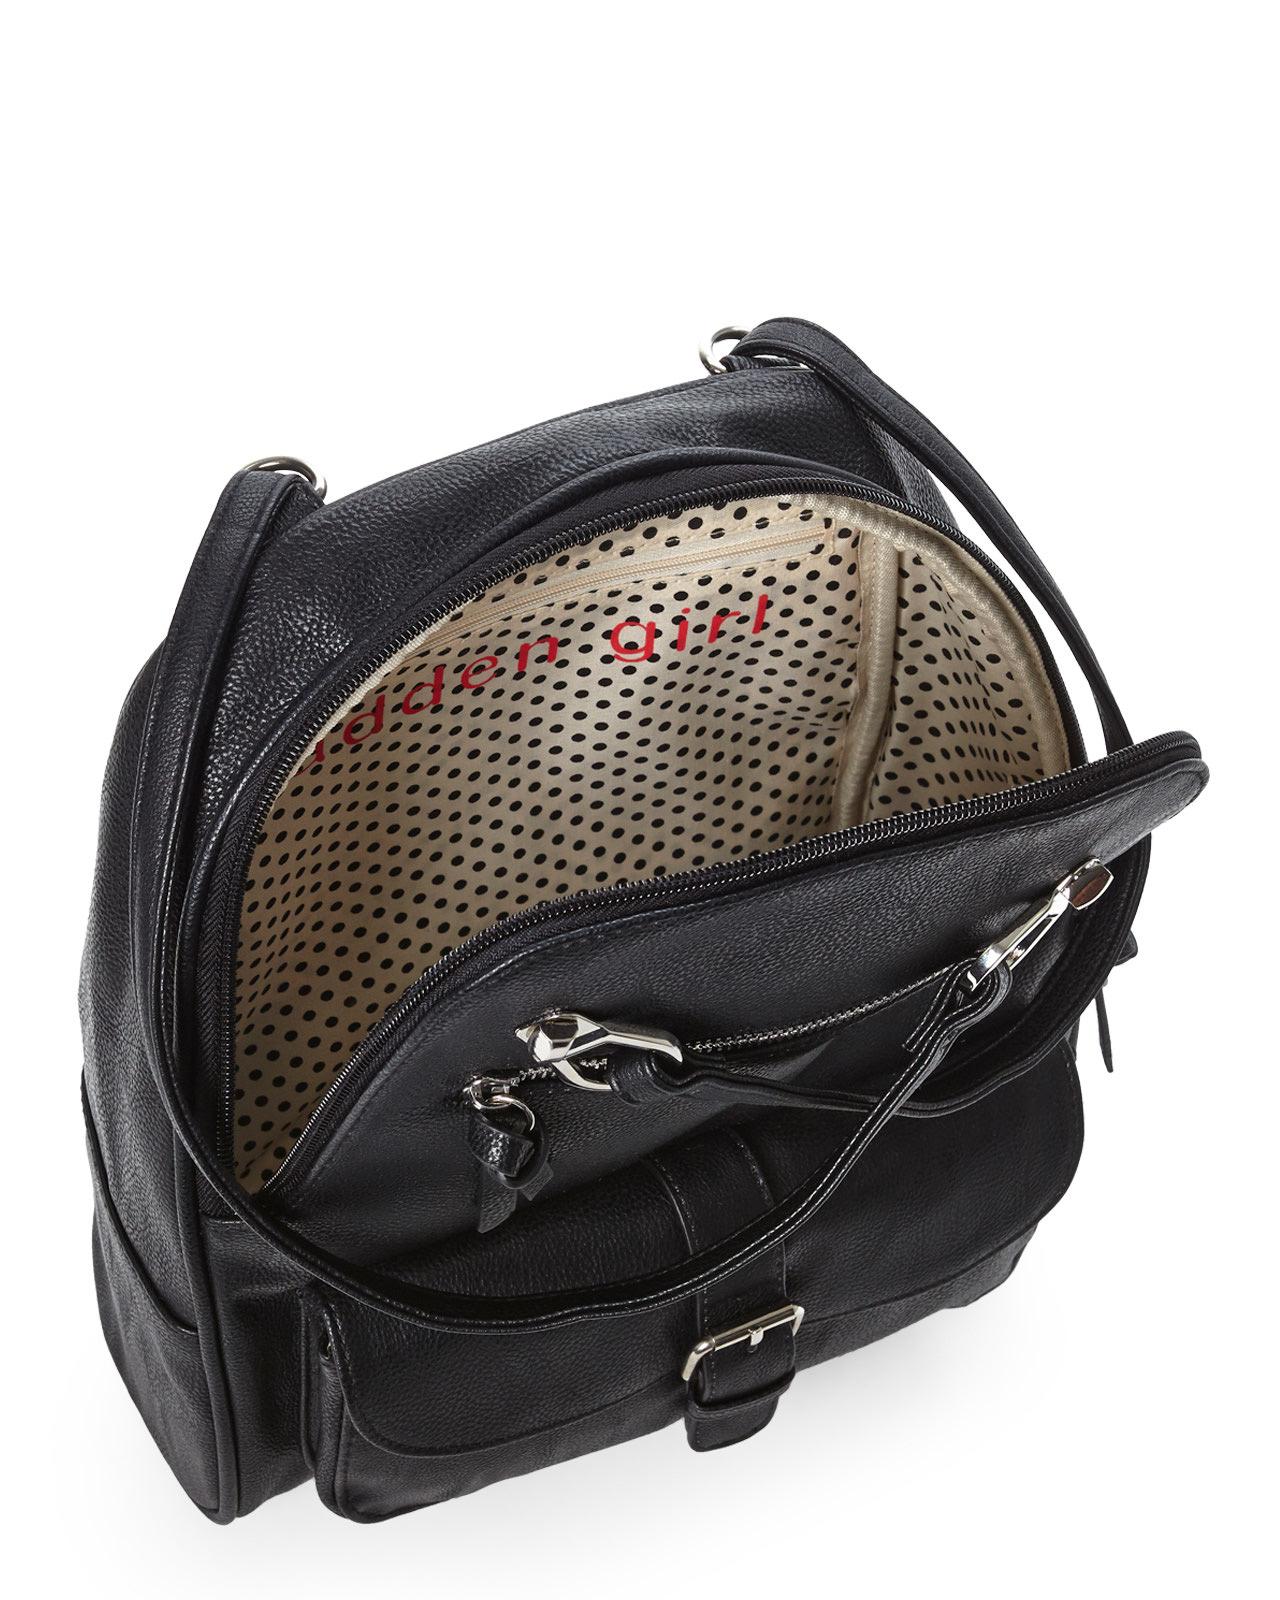 Madden girl Black Mg Twill Backpack in Black | Lyst